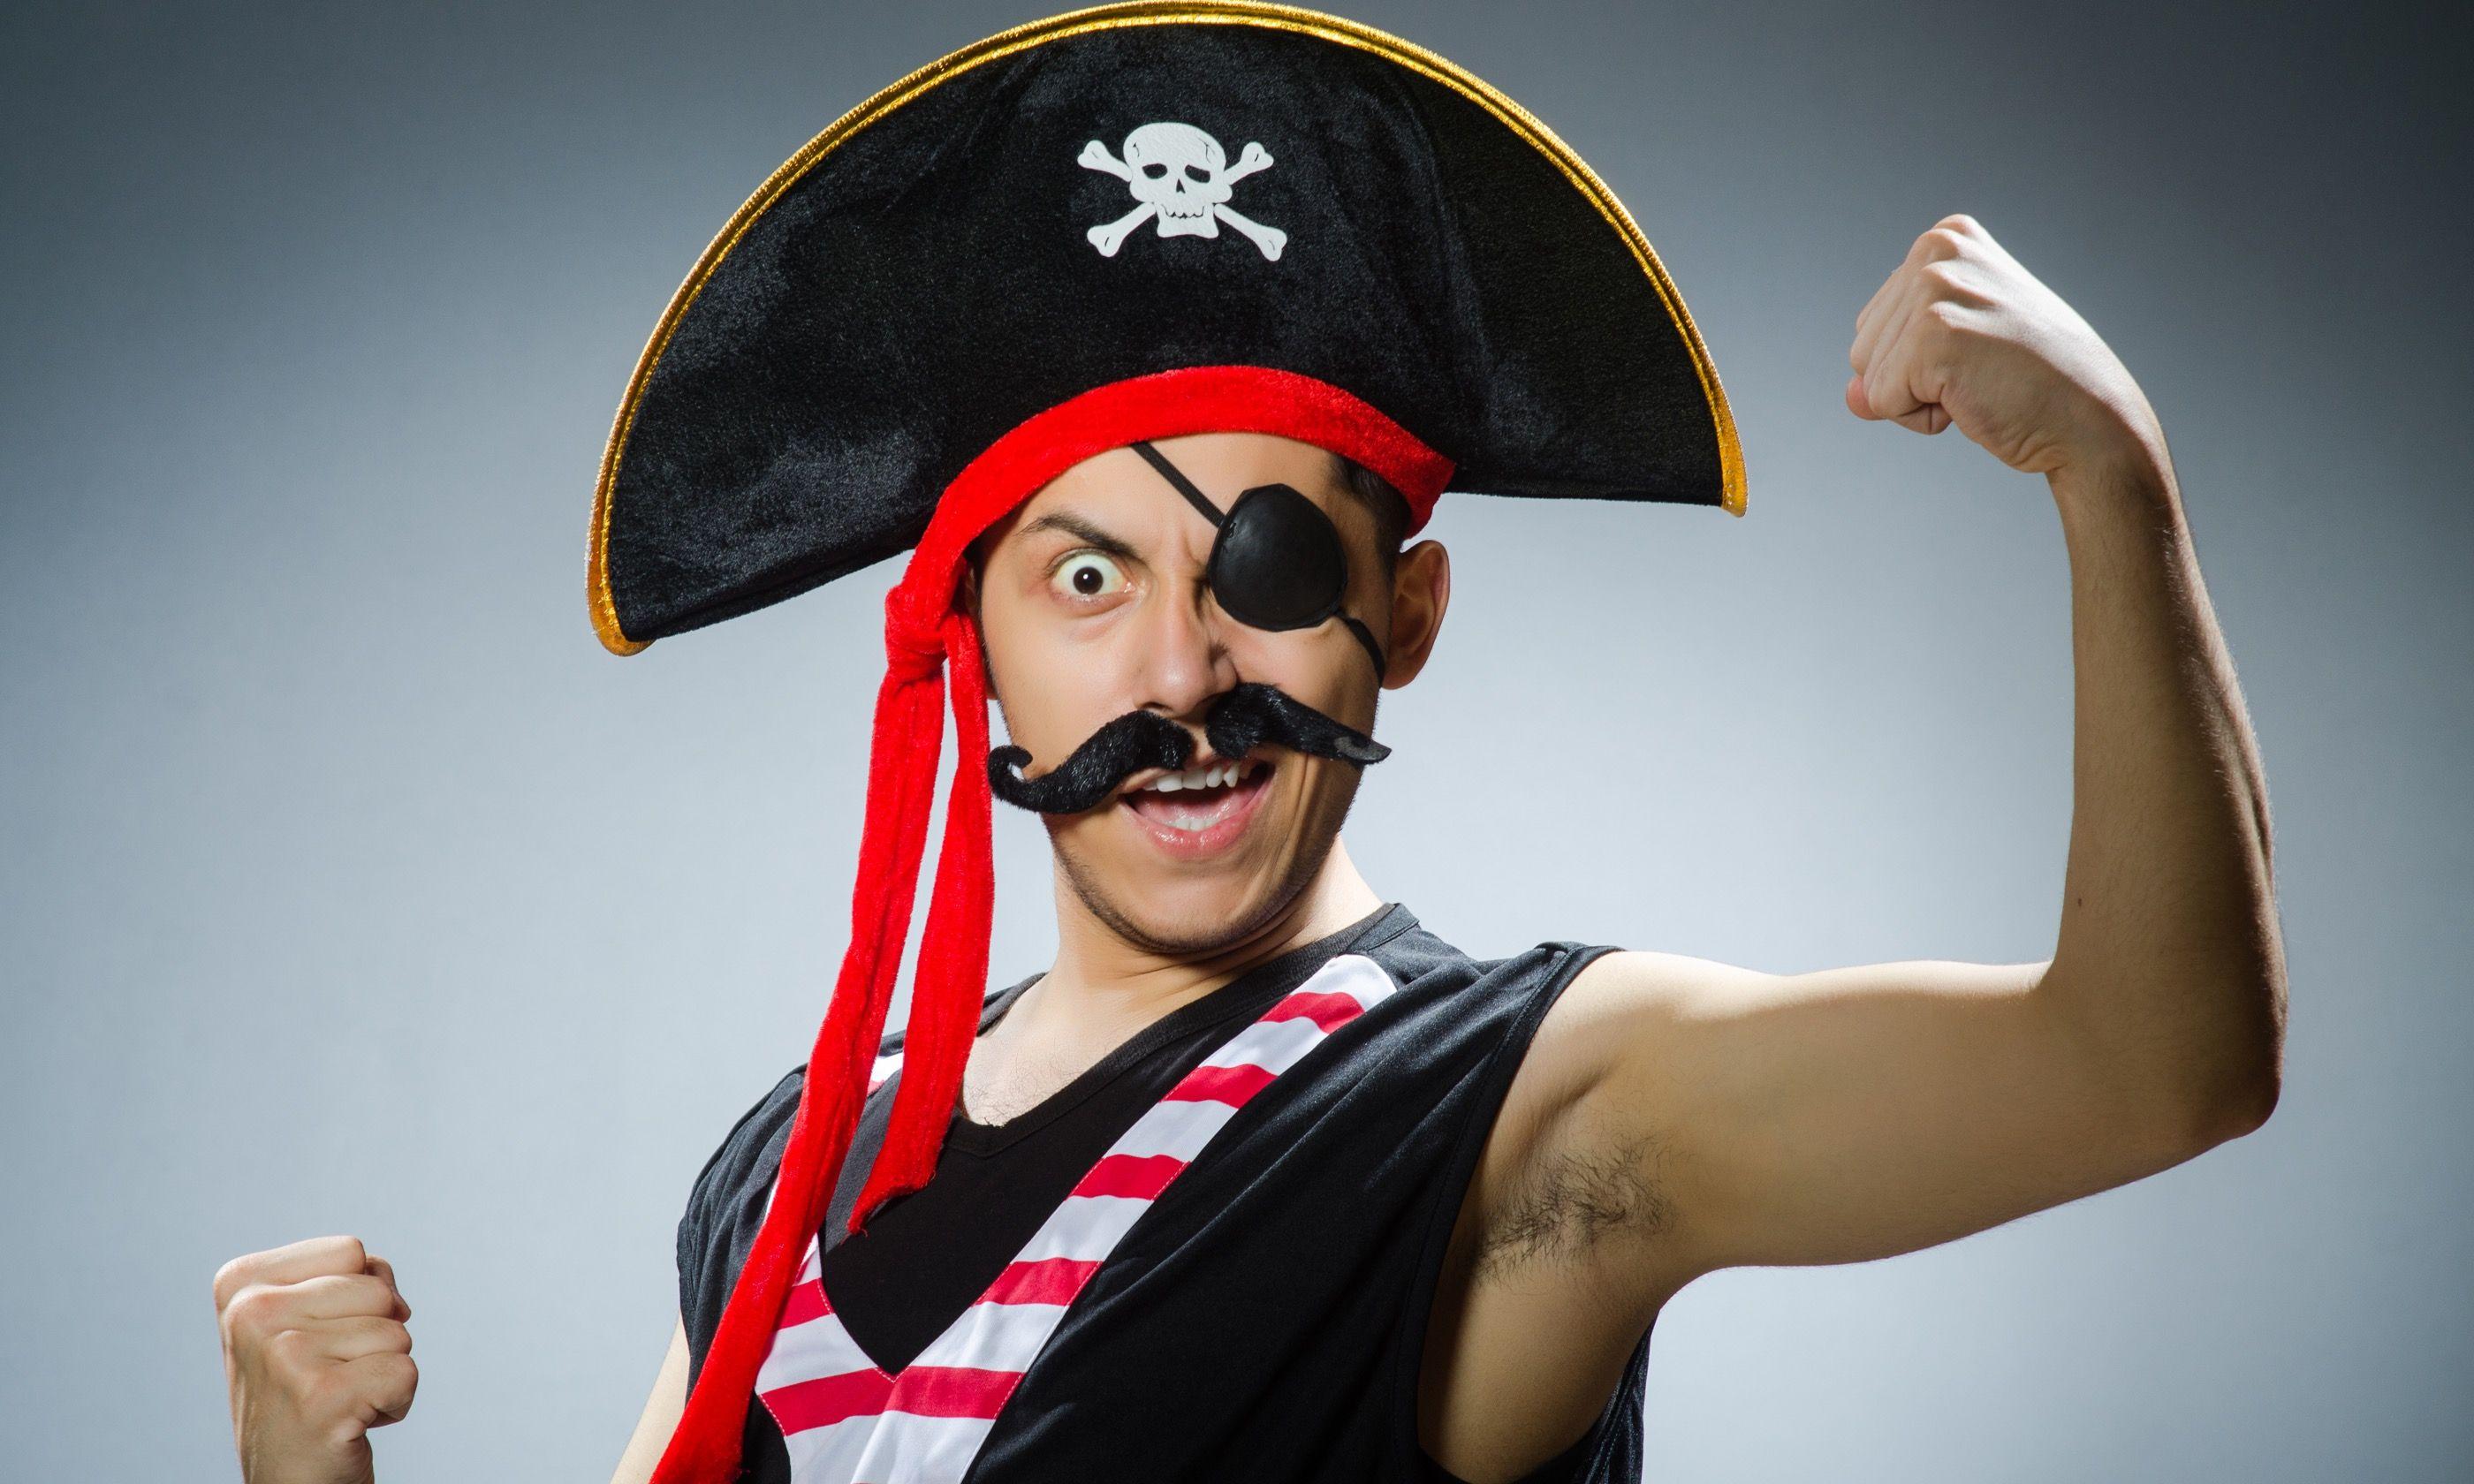 Man dressed as pirate (Shutterstock.com)